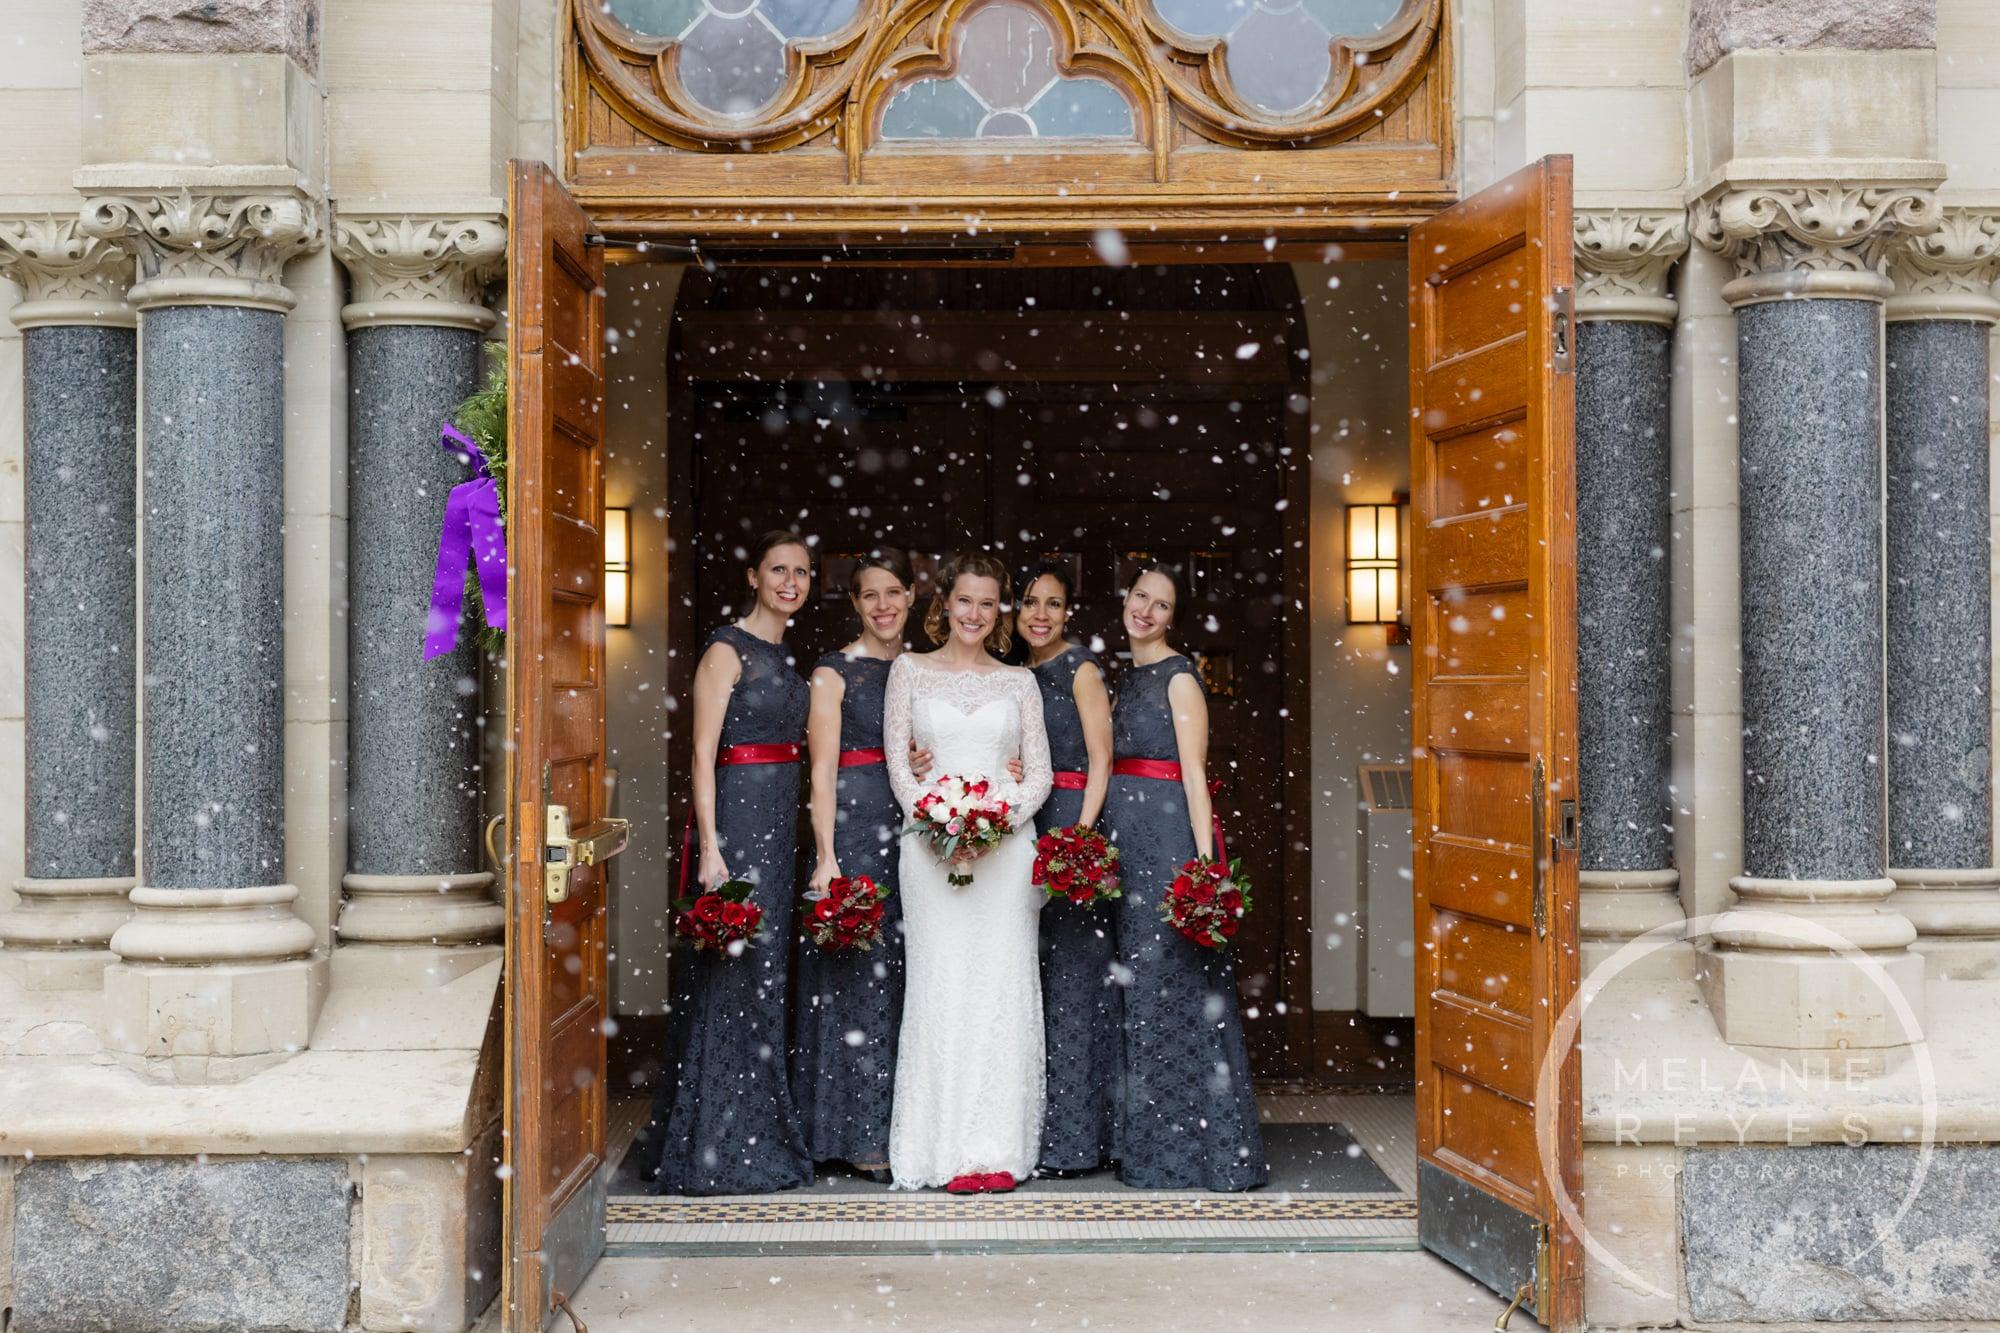 2015_ann_arbor_wedding_photographer_melaniereyes_014.JPG